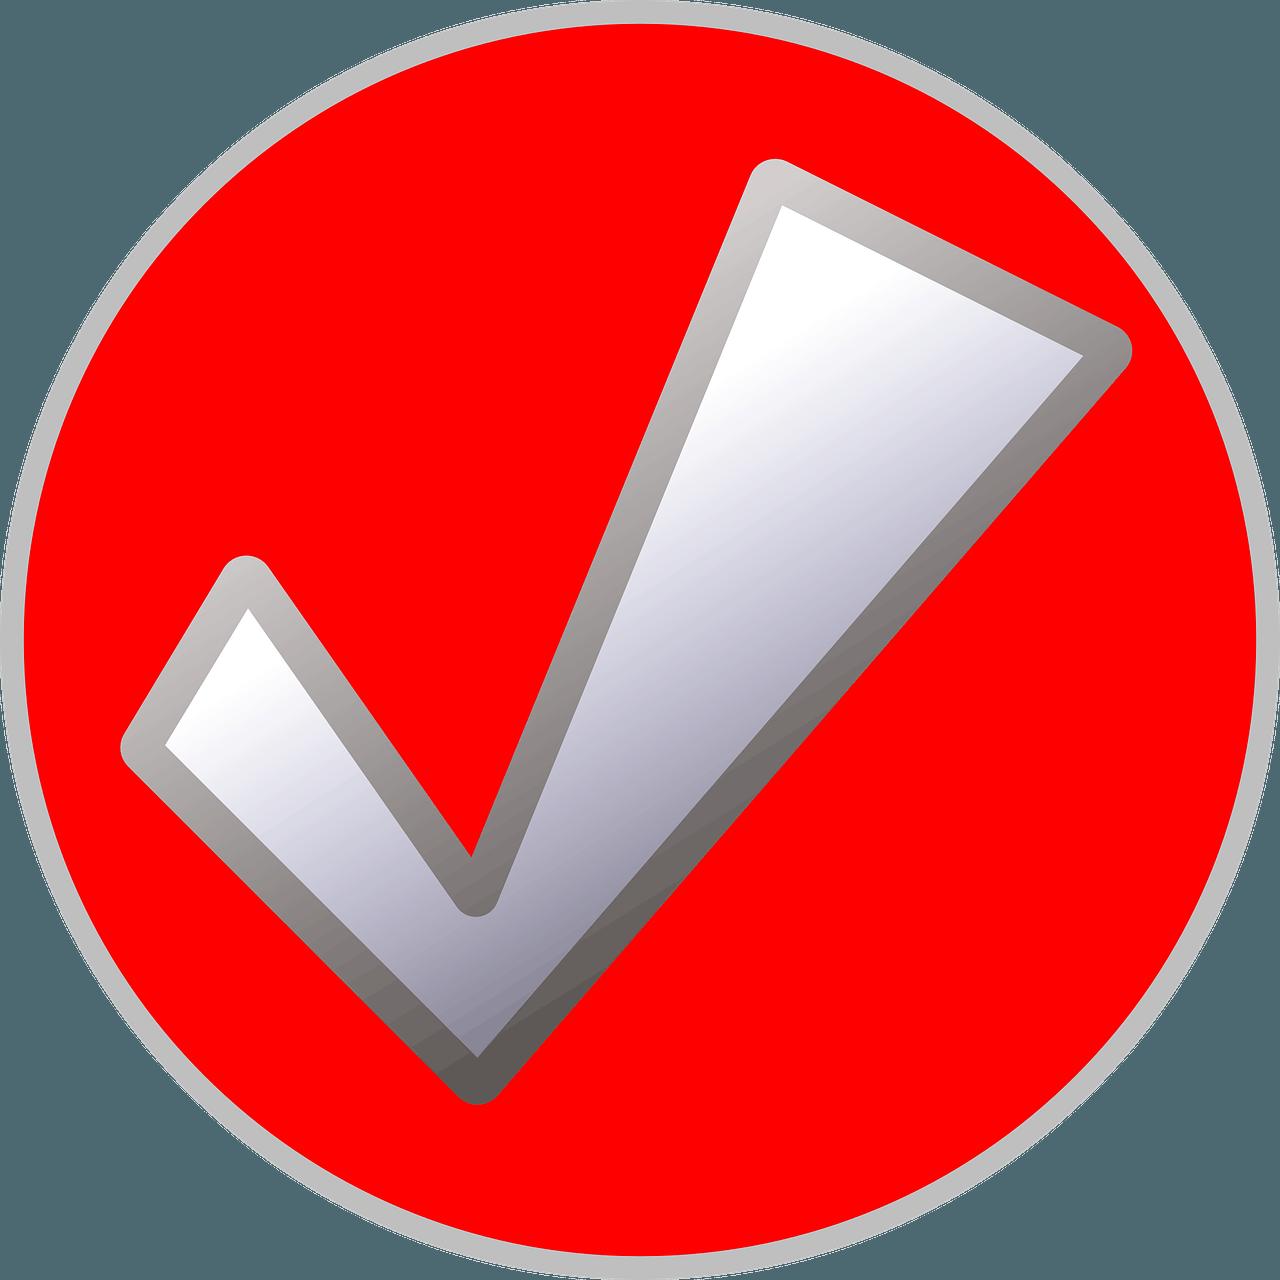 verification of identity